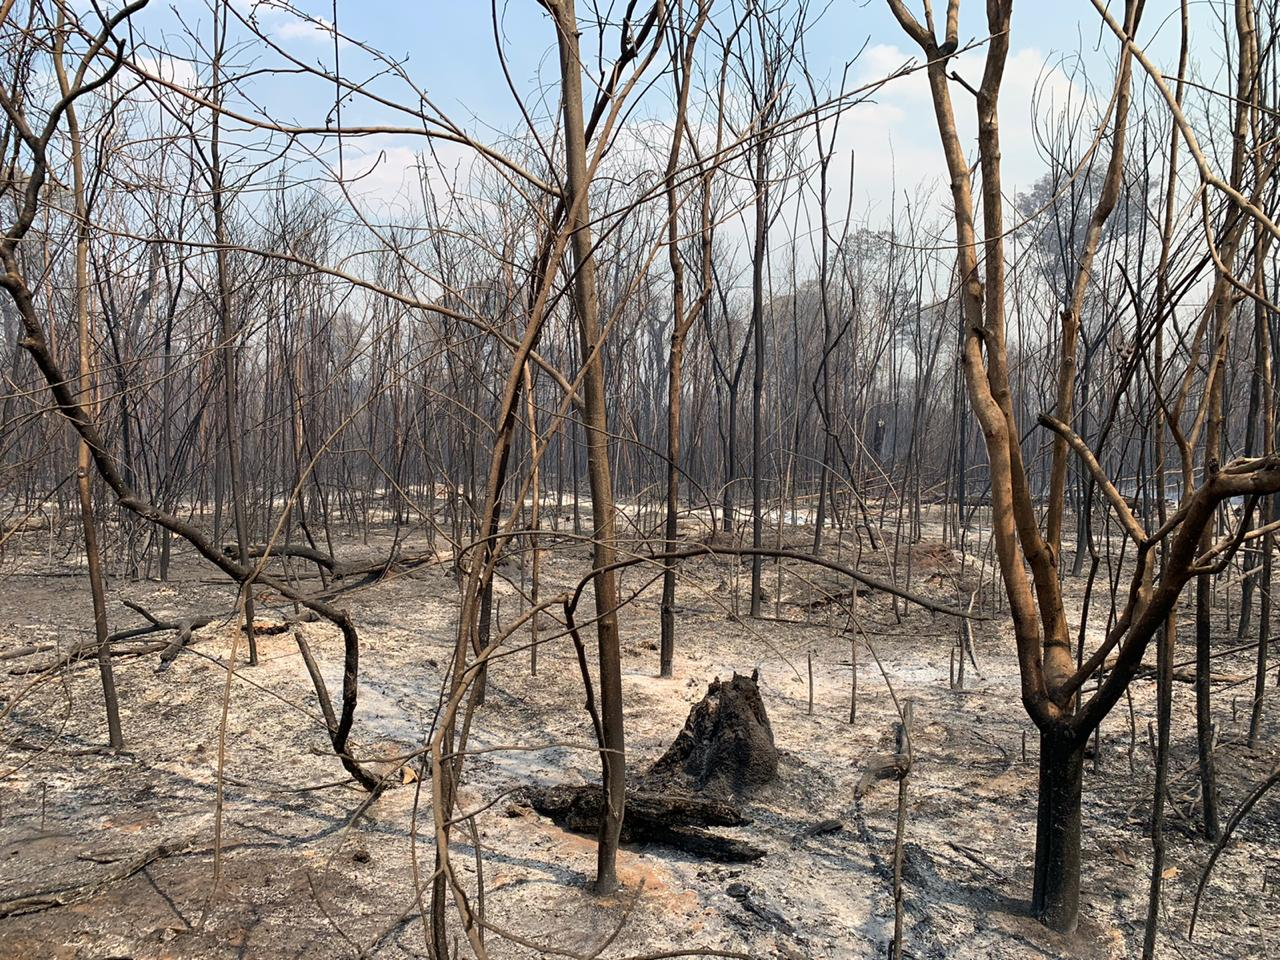 Forest fires Xingu - credit Takumã Kuikuro